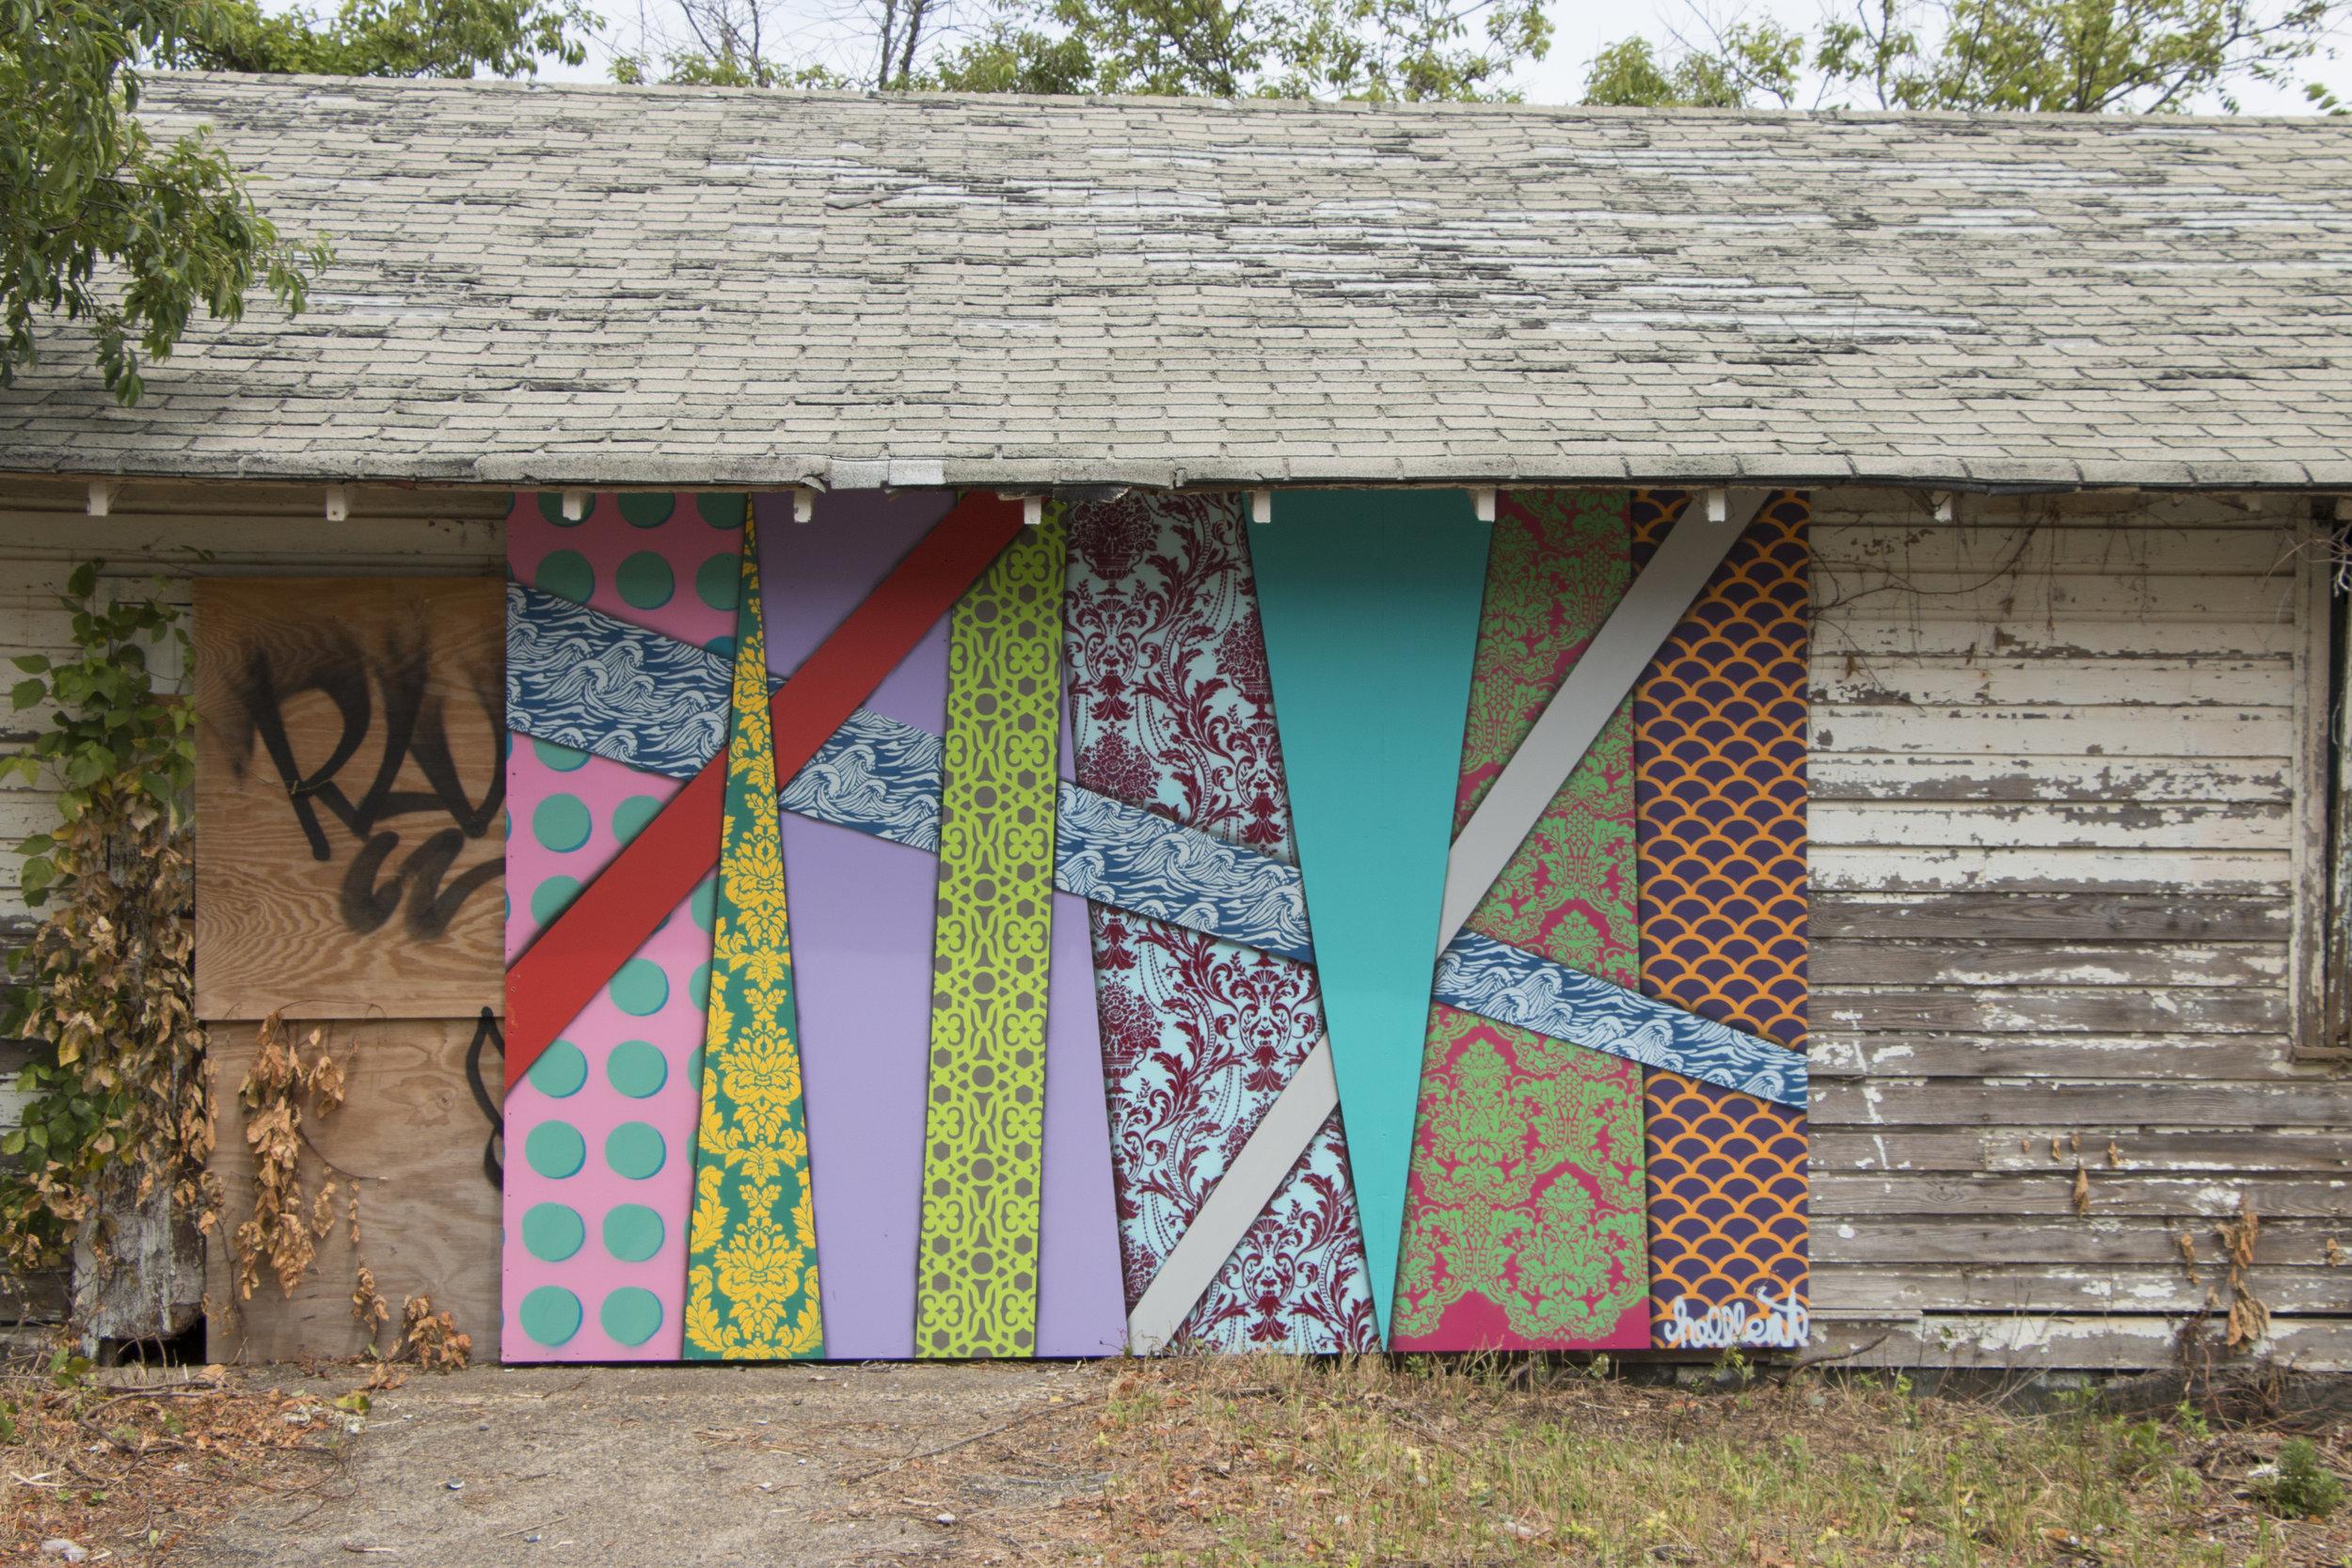 Mural install for Rockaway Artist Alliance